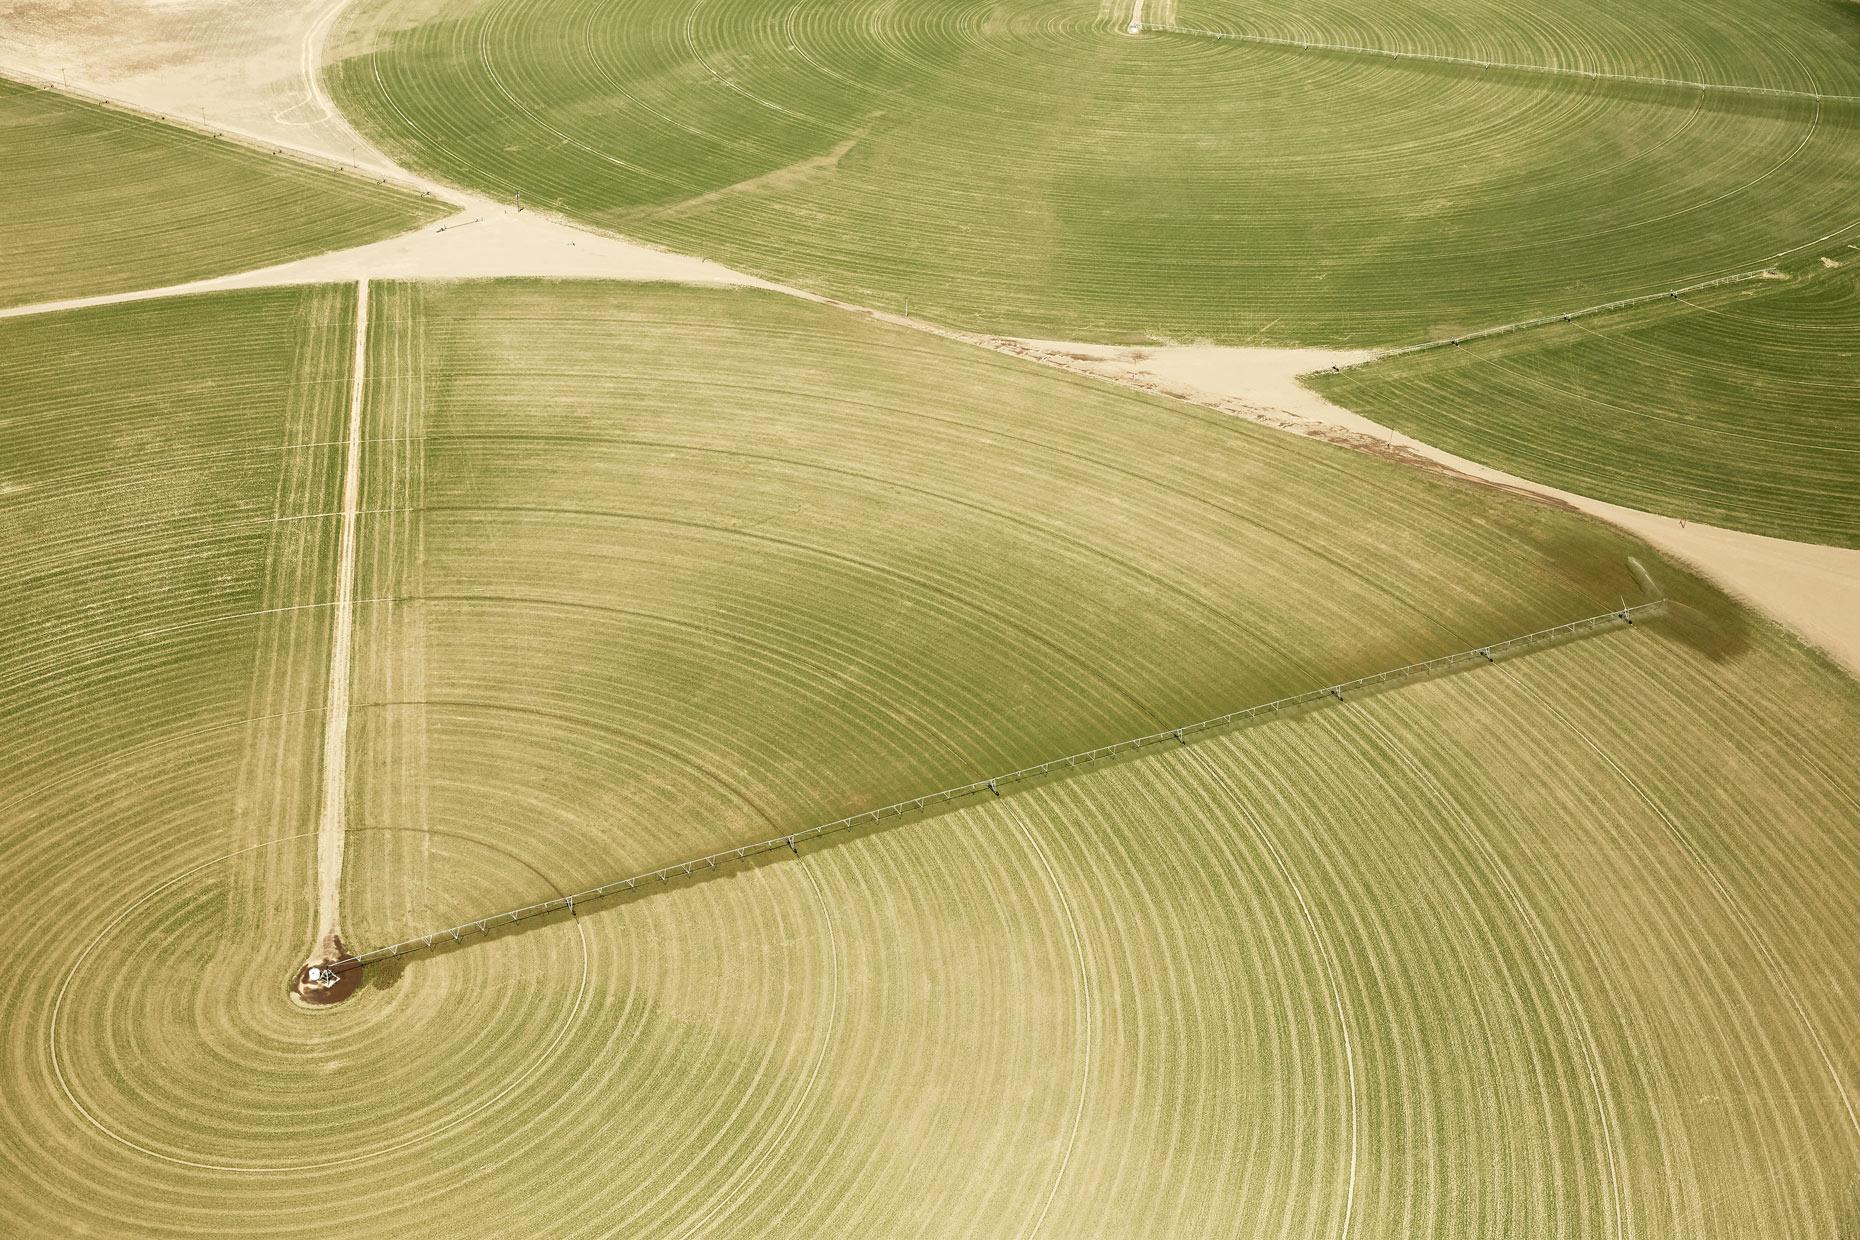 Aerial Photography Derek Israelsen Green Crop Circles